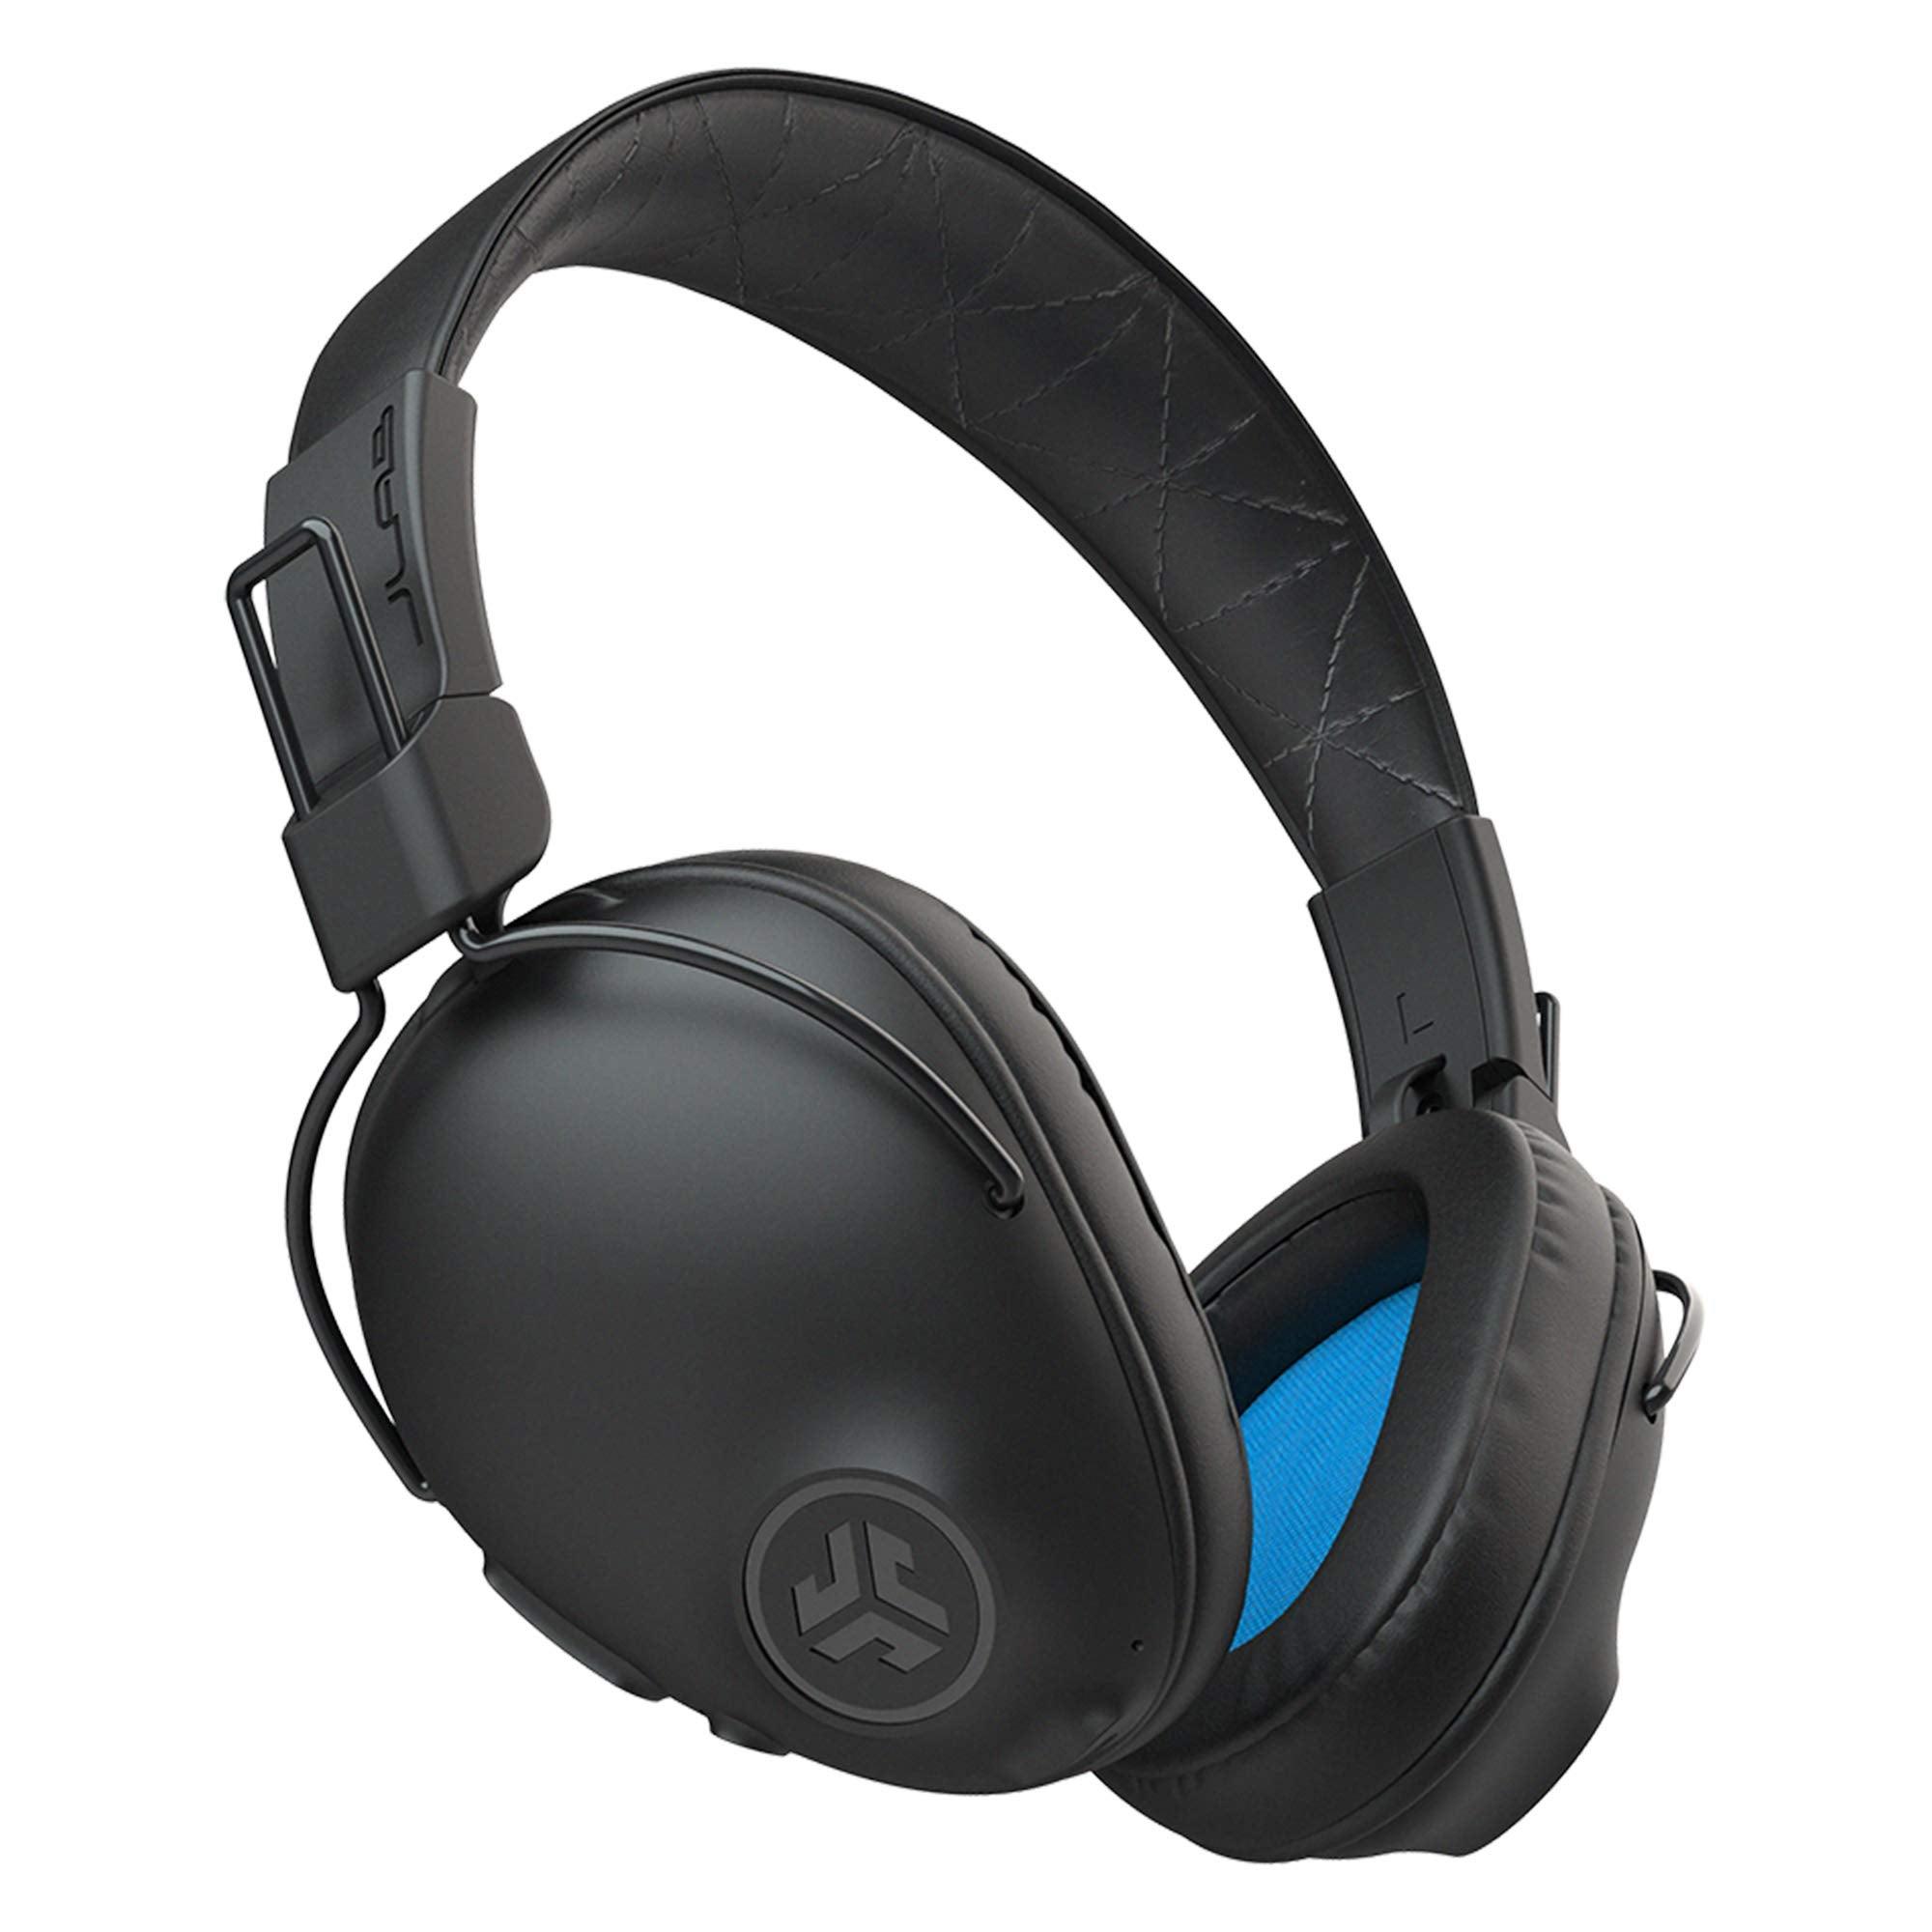 JLab Audio Studio Pro Headphones